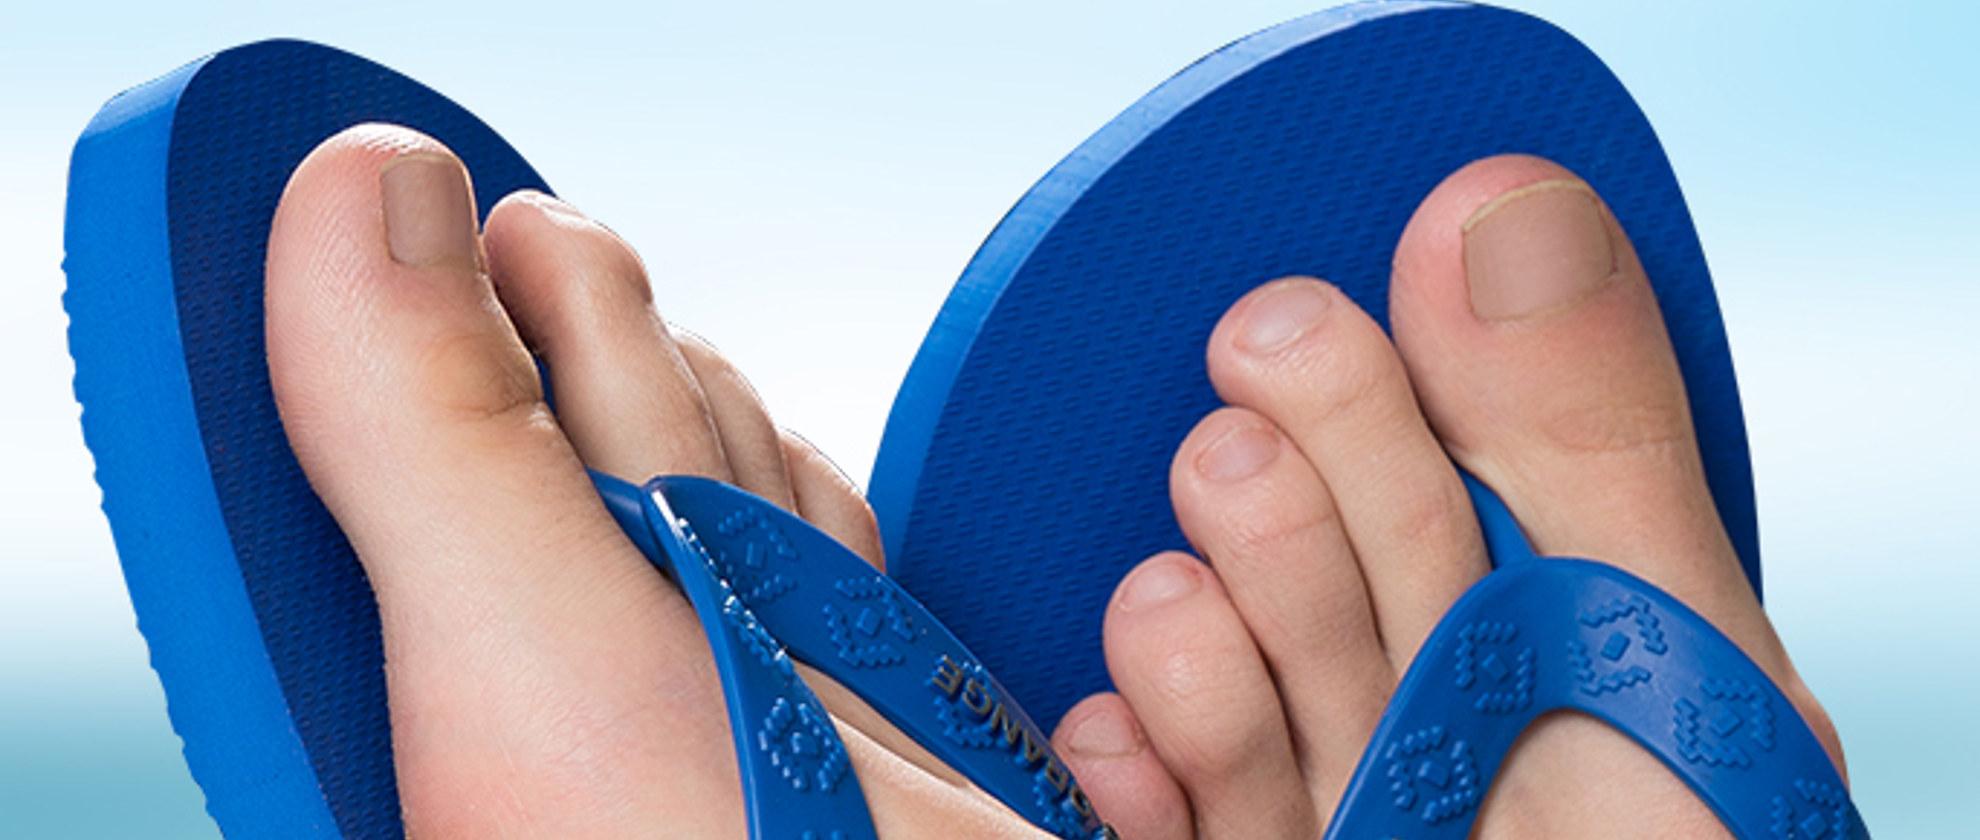 Men, Are Your Feet Beach Ready?